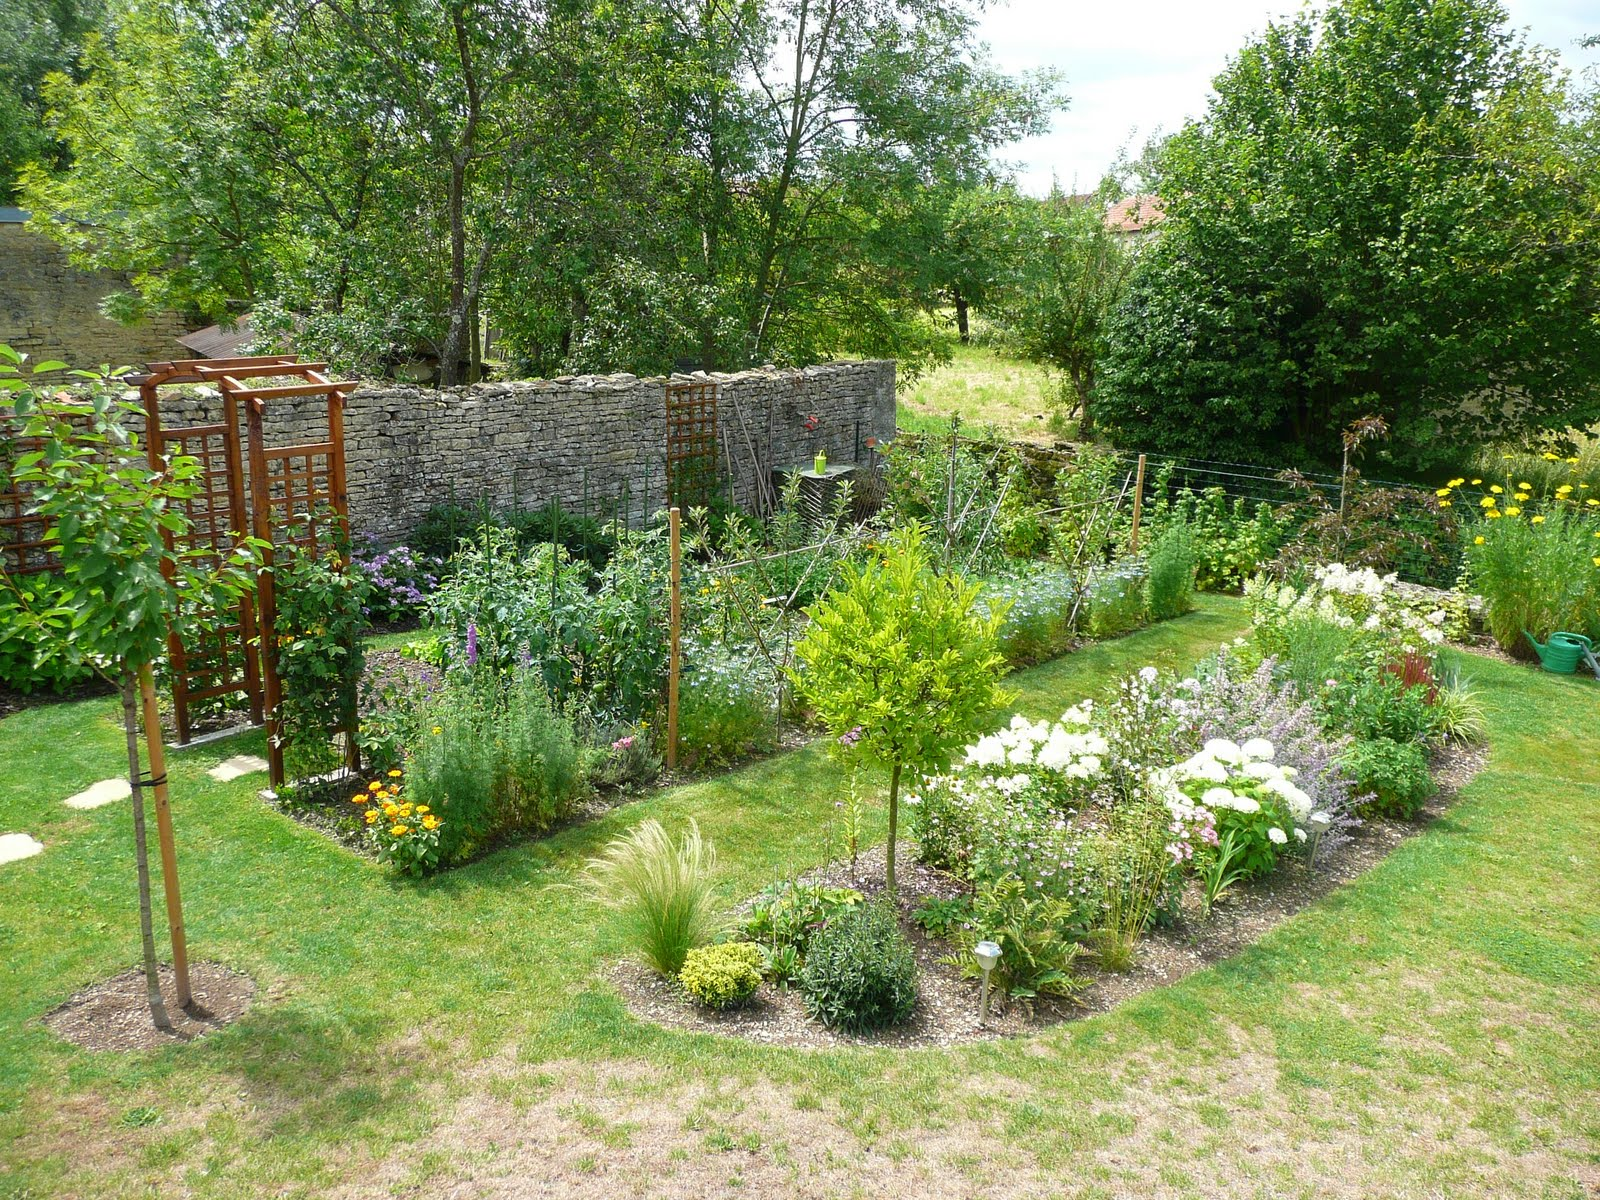 notre jardin secret massif pinky winky avant apr s. Black Bedroom Furniture Sets. Home Design Ideas